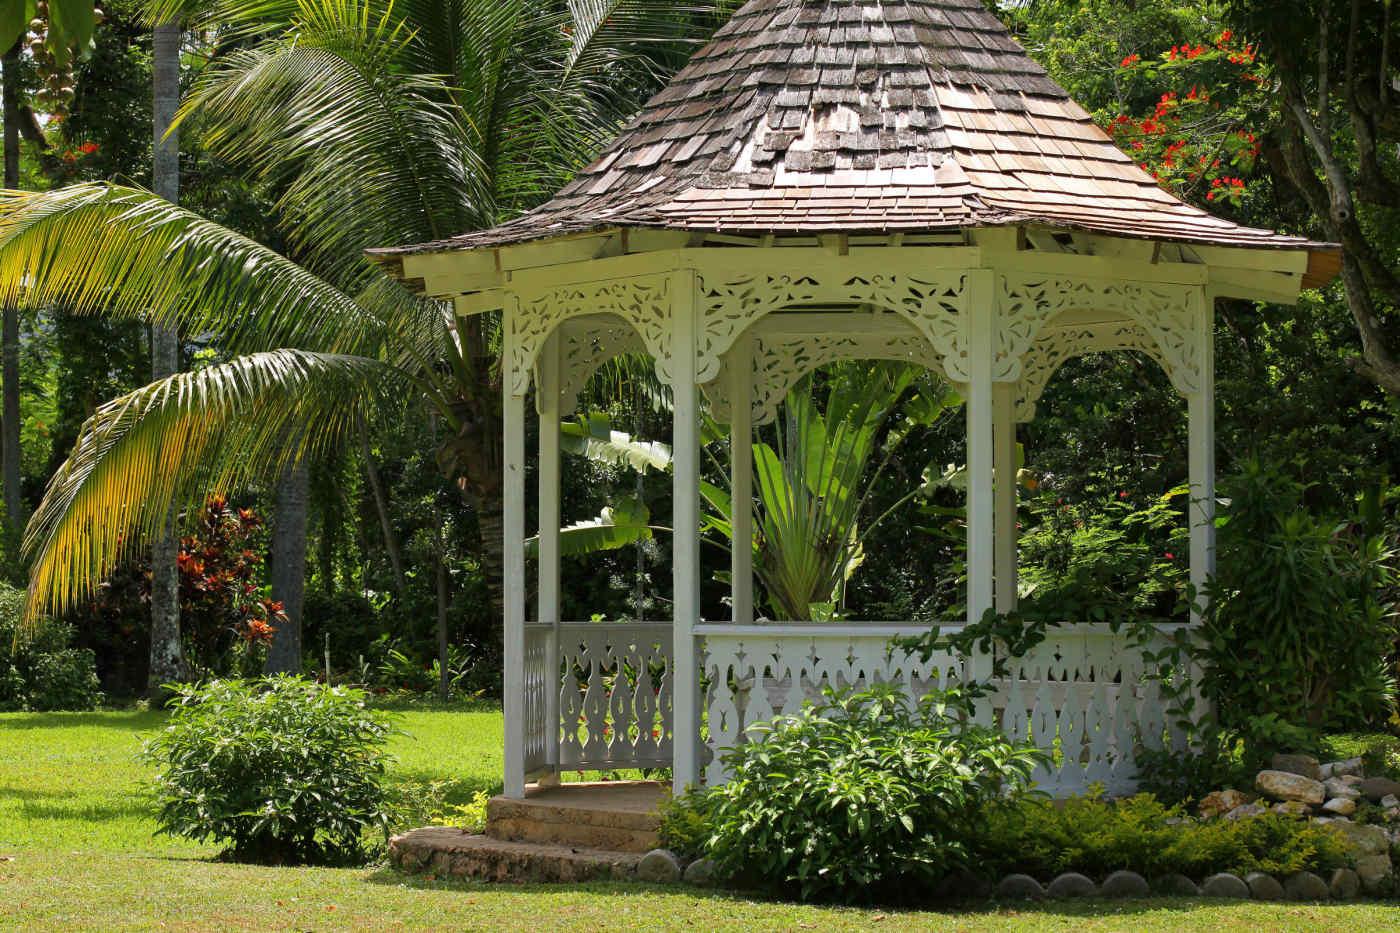 Shaw Park Botanical Gardens